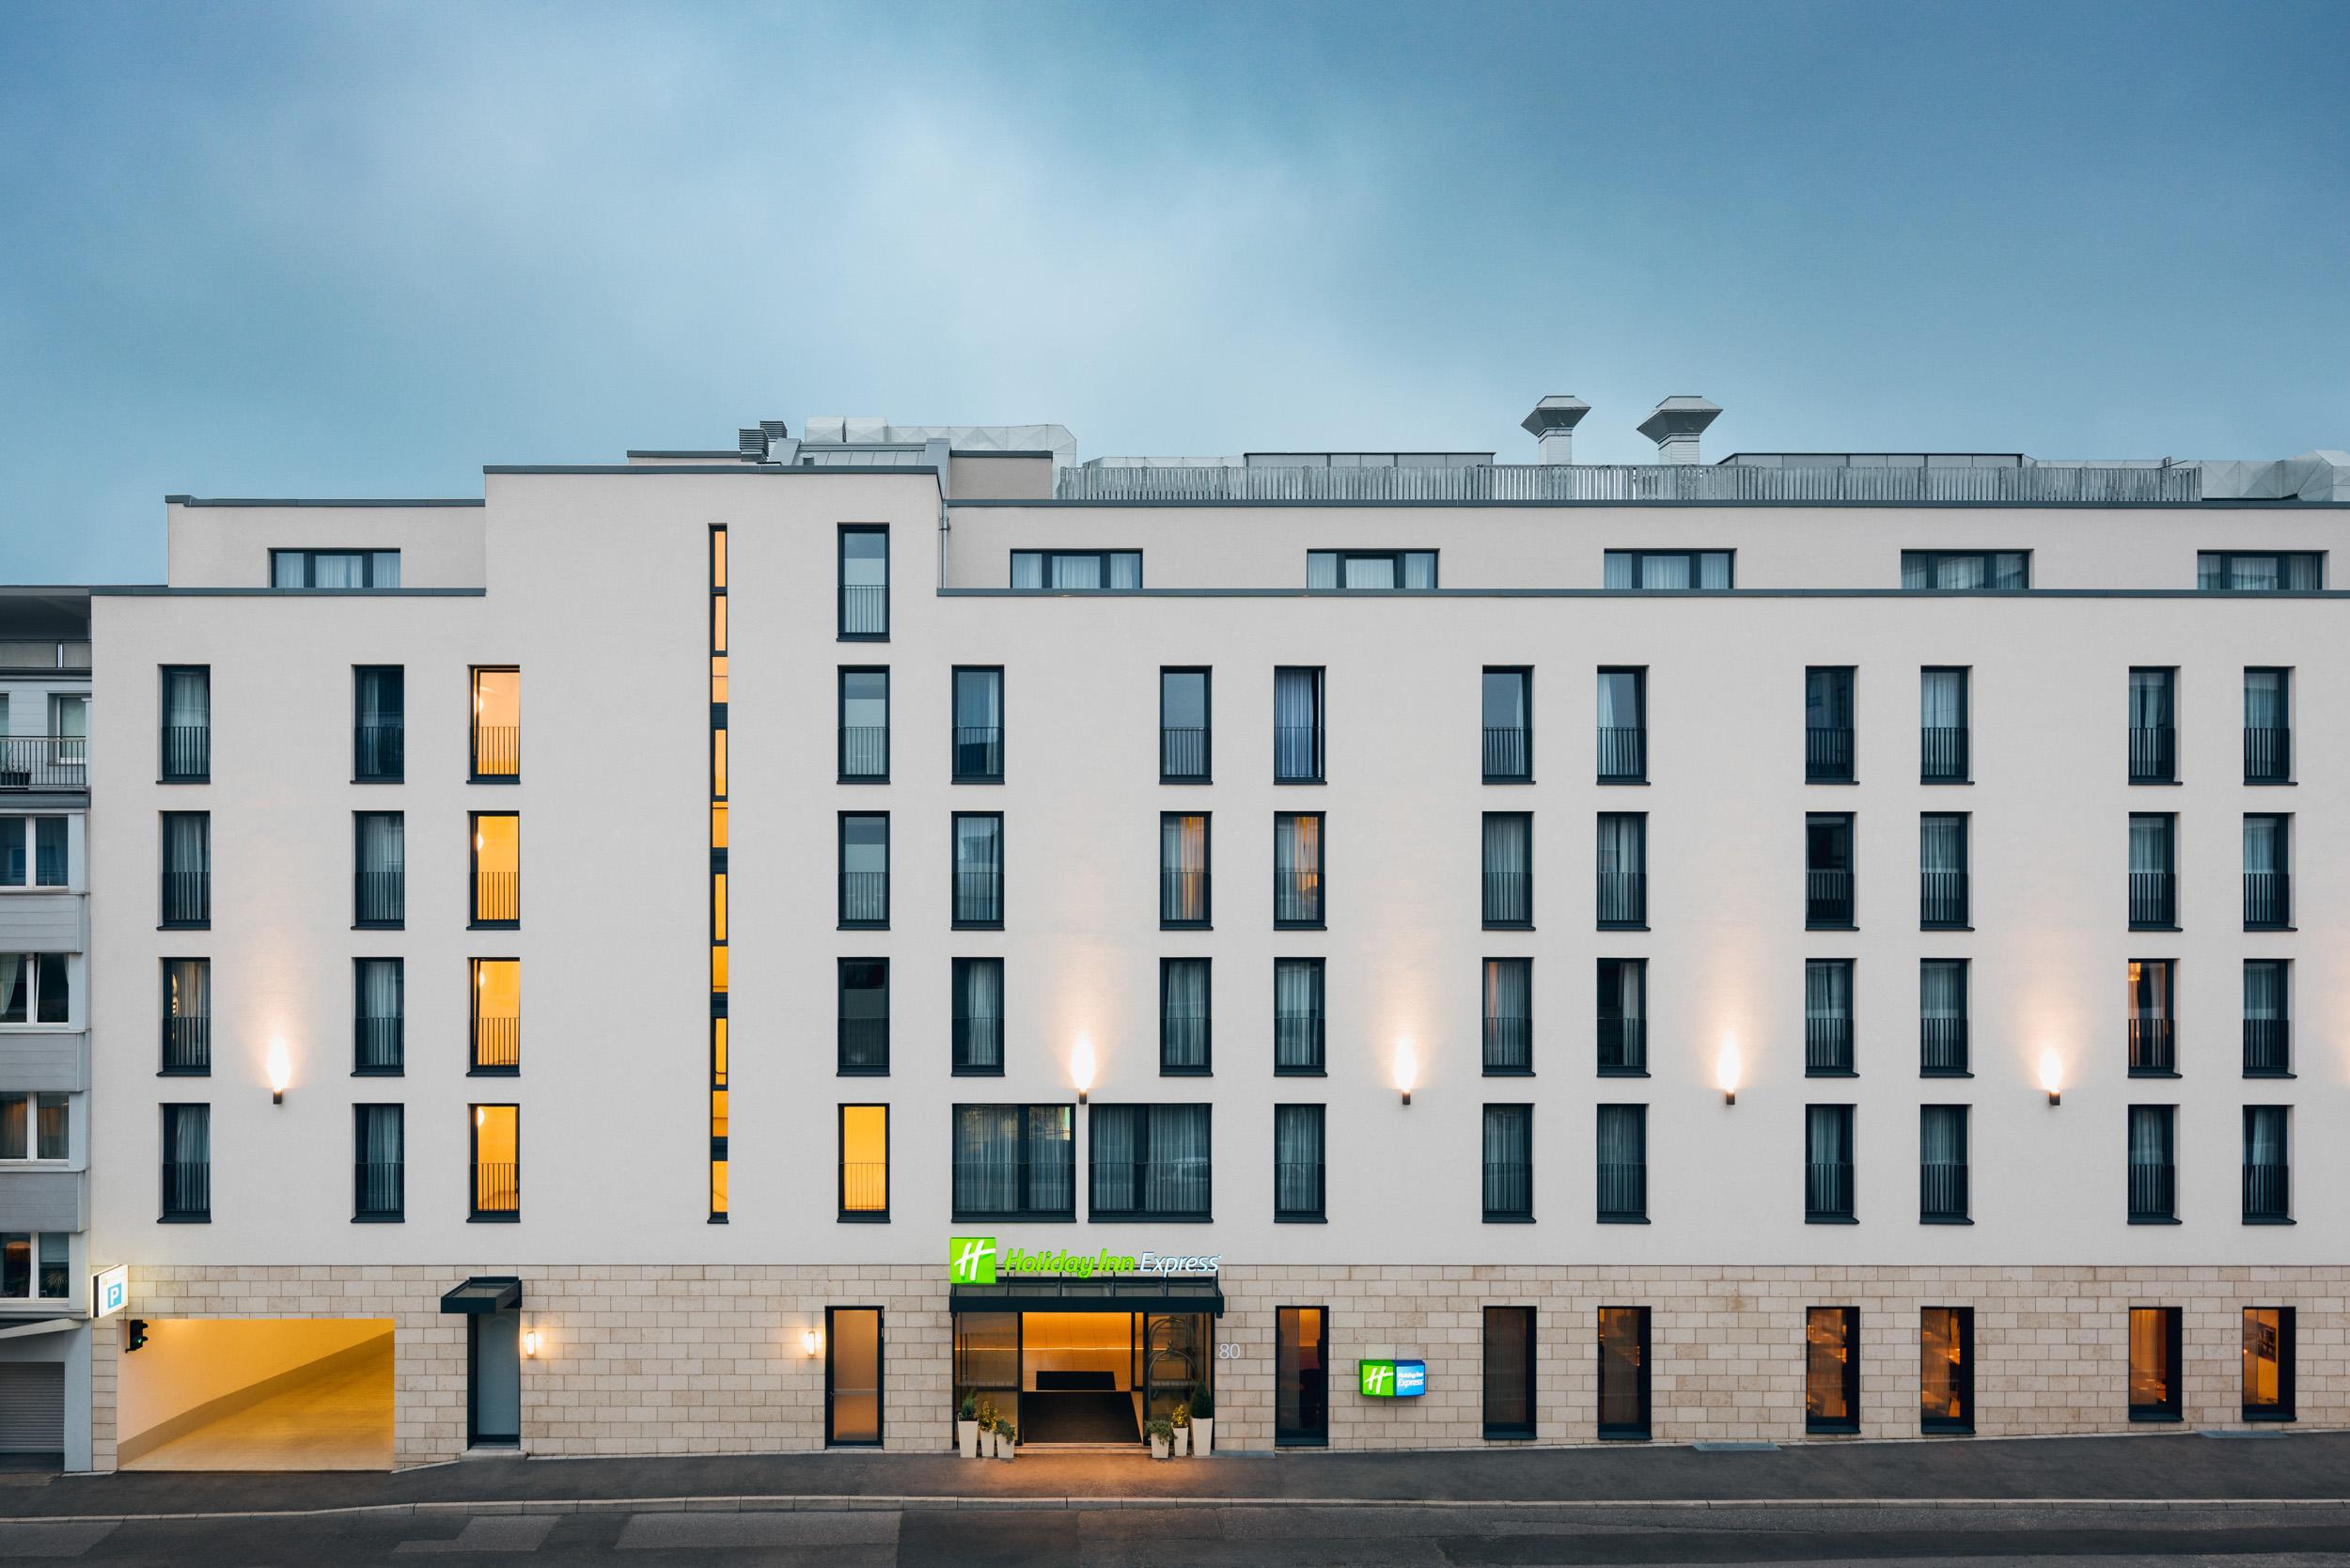 Gustav-Epple-Bauunternehmung-Holiday-Inn-Duesseldorf-MLX6967